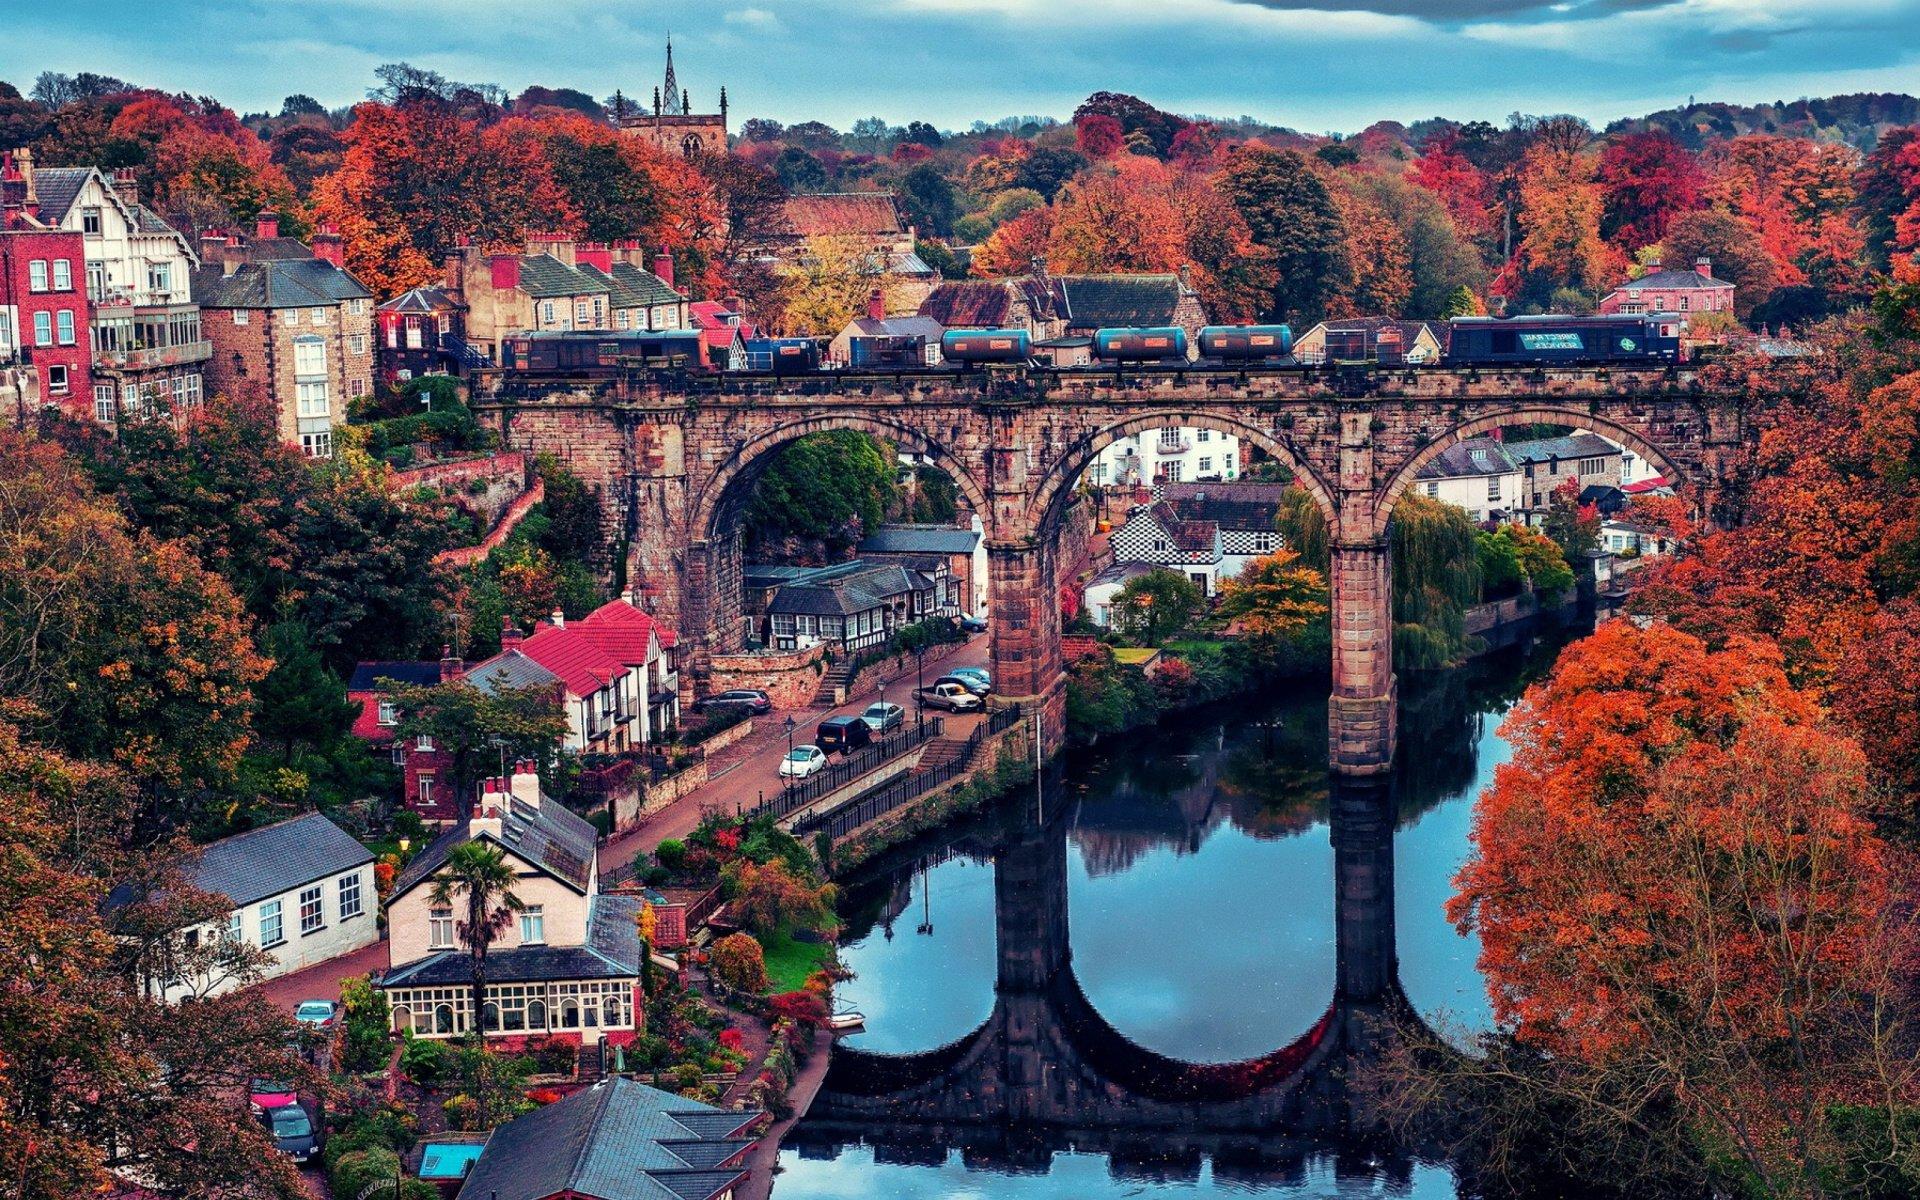 Fall Foliage Hd Wallpaper North Yorkshire England Hd Wallpaper Background Image